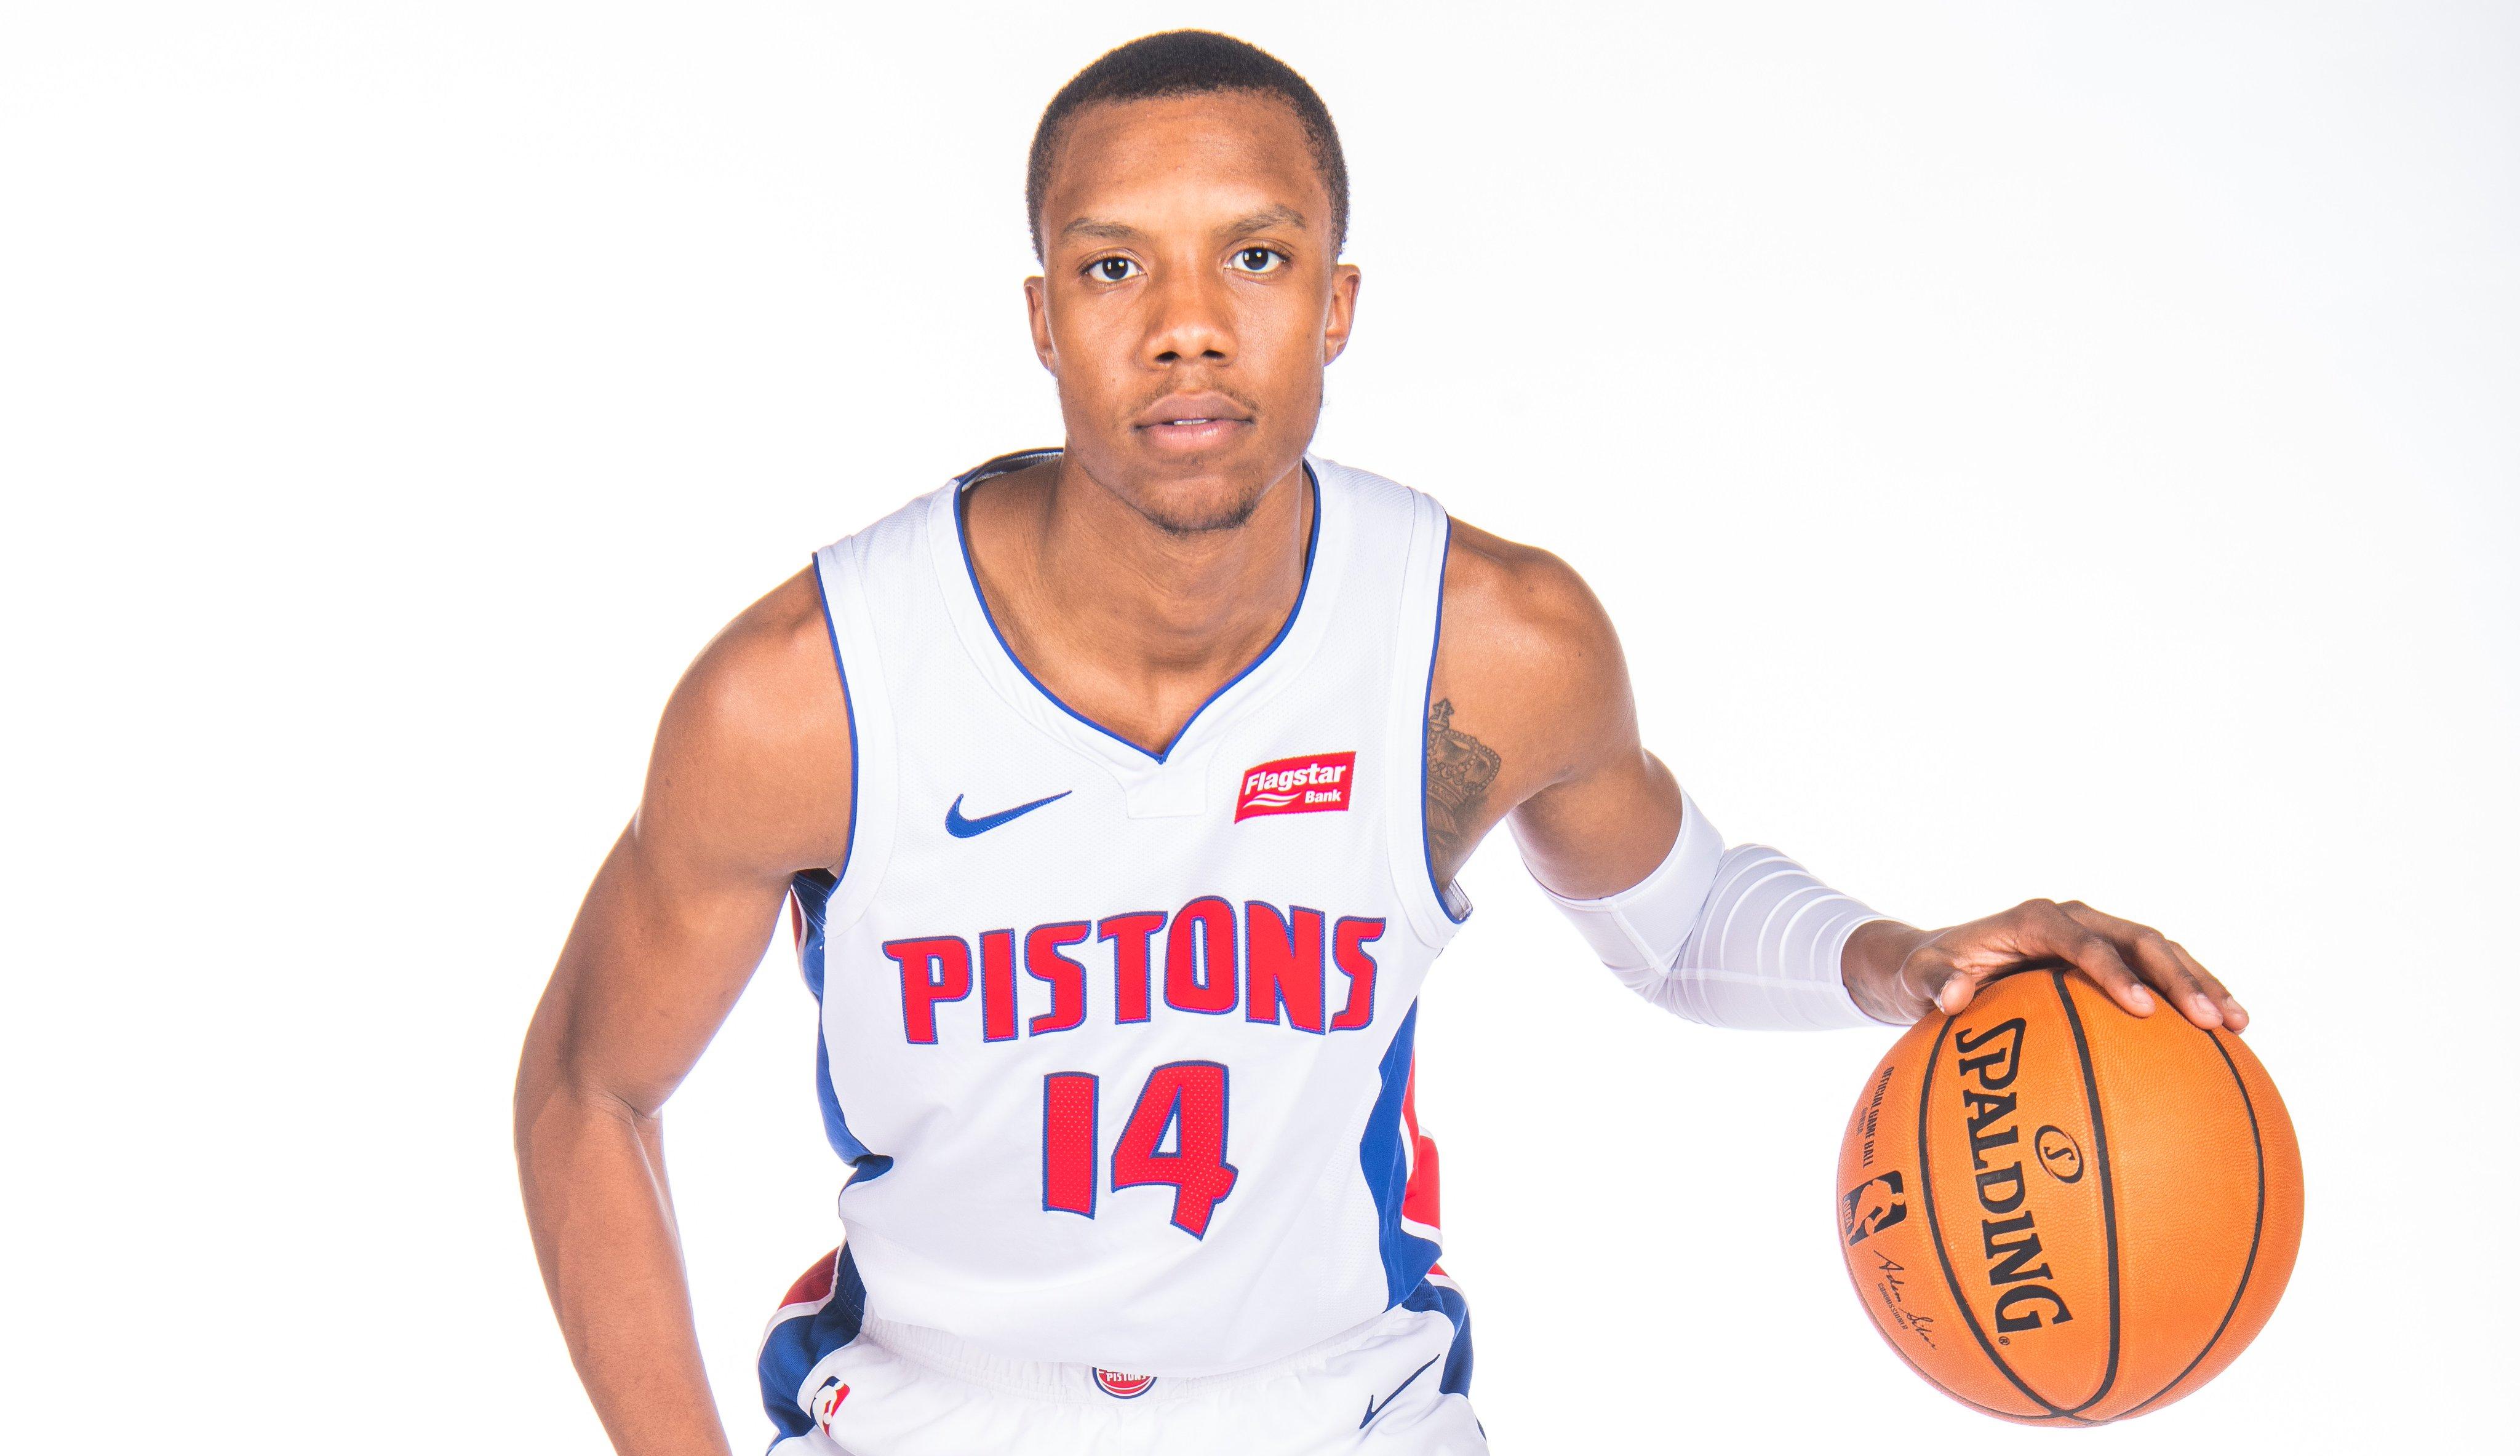 NBA官方祝活塞球员路易斯-金21岁生日快乐